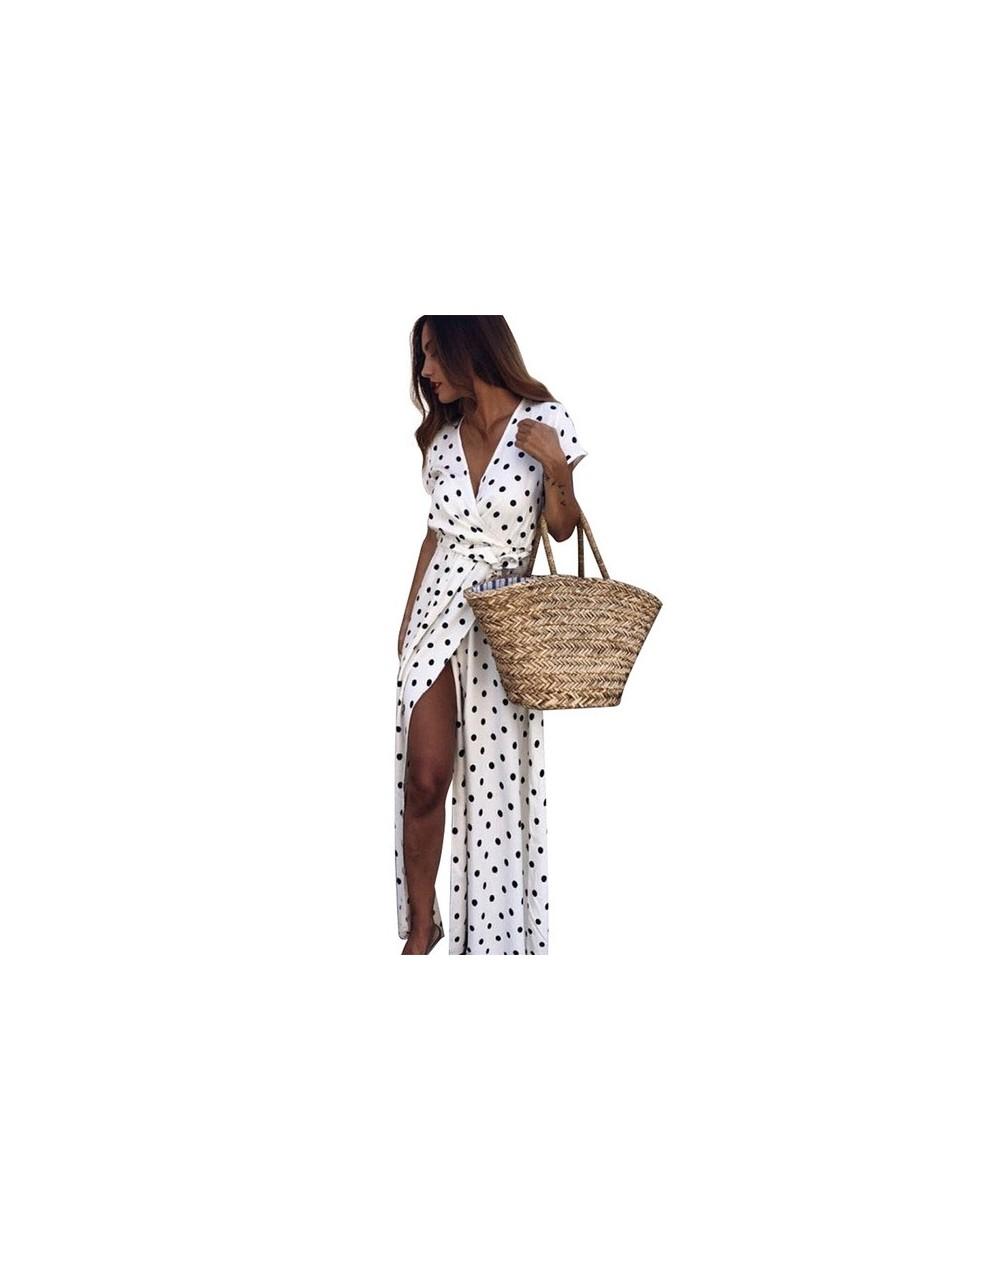 New Summer Women Long Dress Polka Dot Print Short Sleeve V-neck High Split Dresses Woman Party Night Casual Beach Maxi Dress...